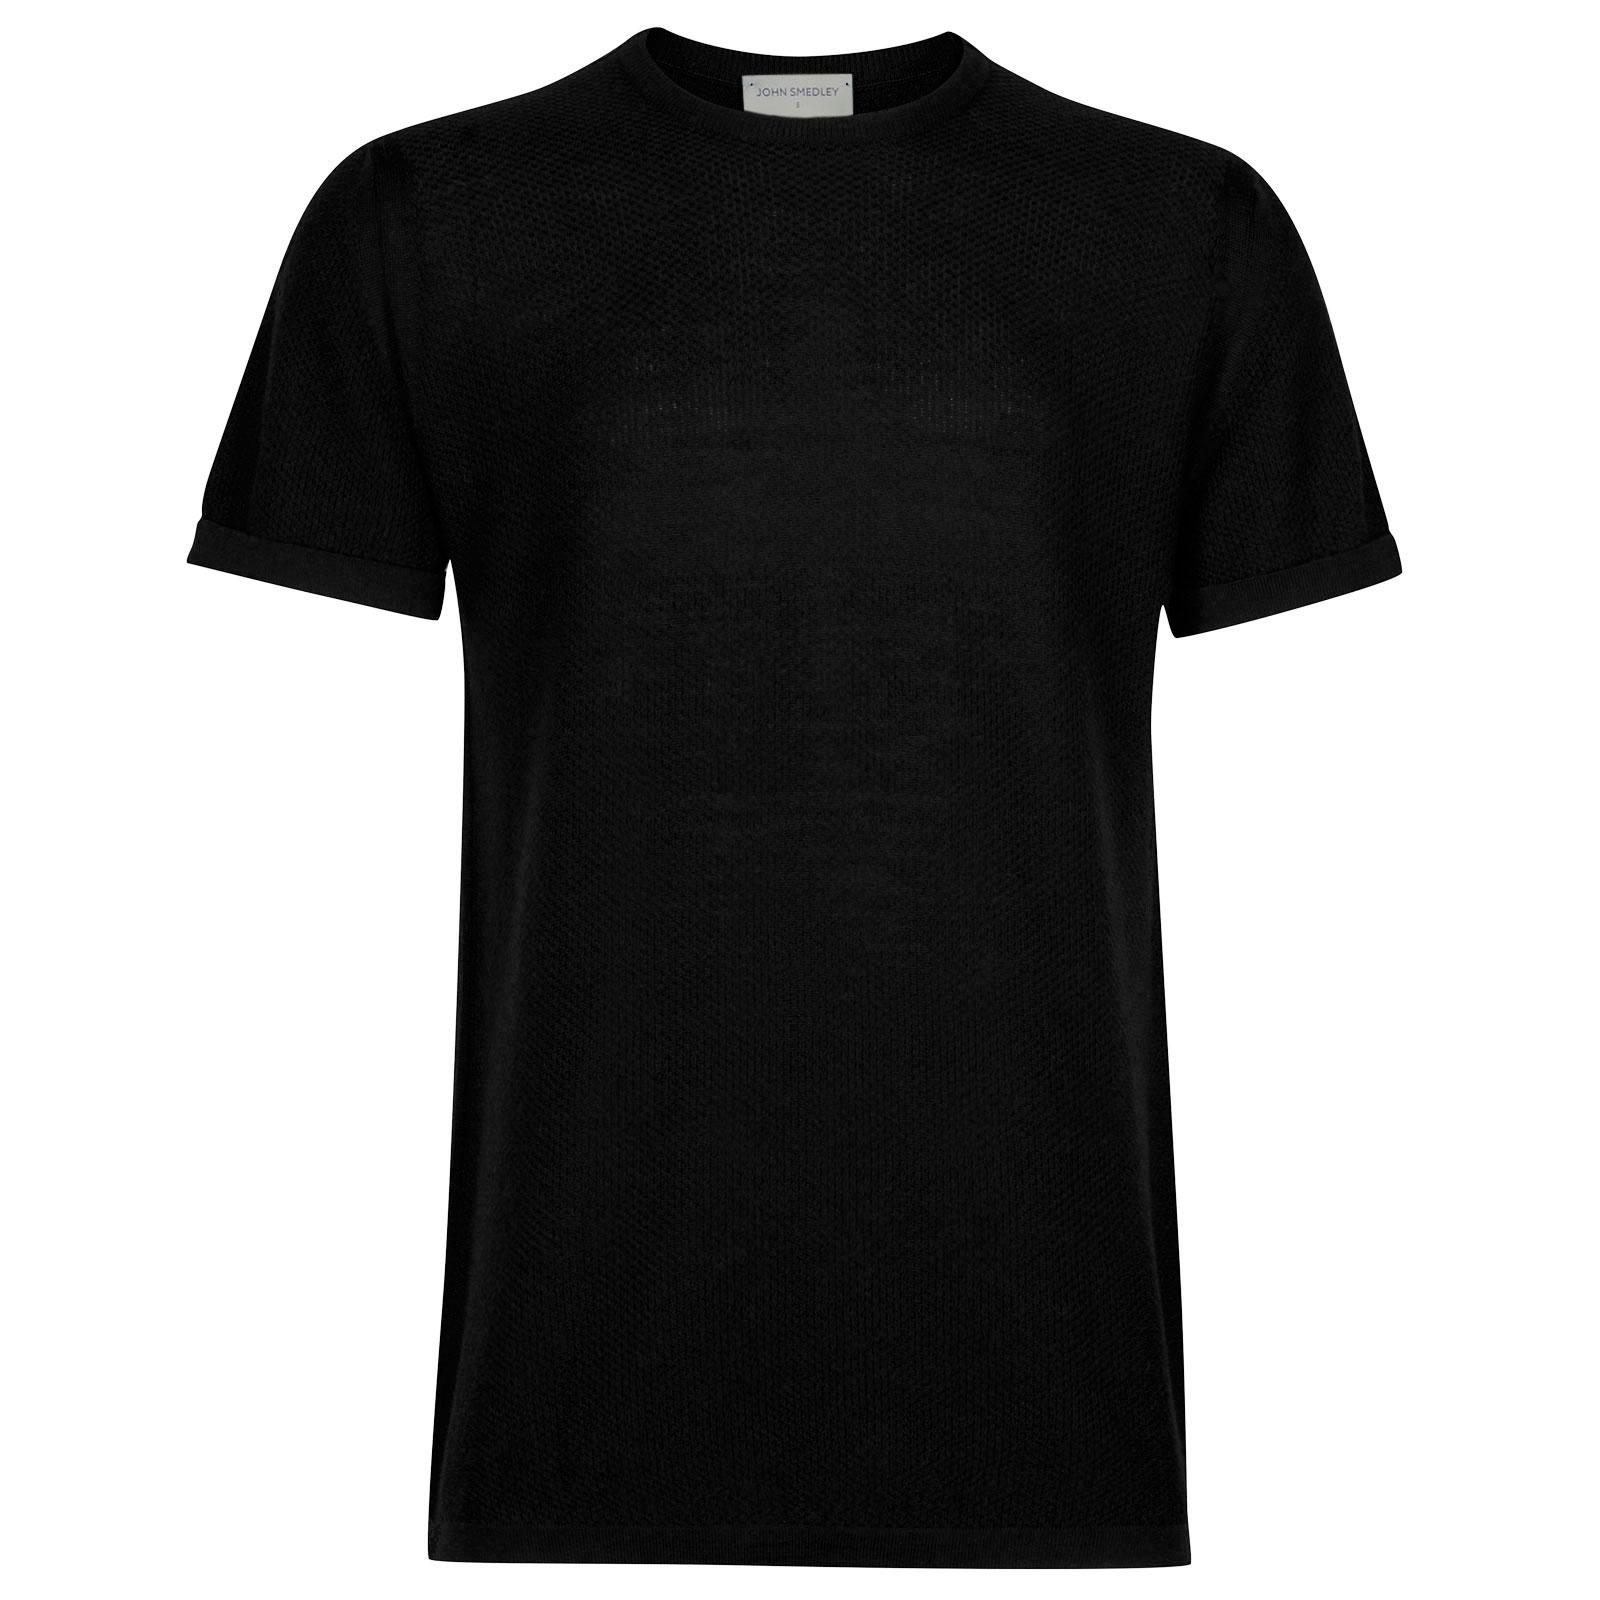 John Smedley 2Singular Merino Wool T-Shirt in Black-S